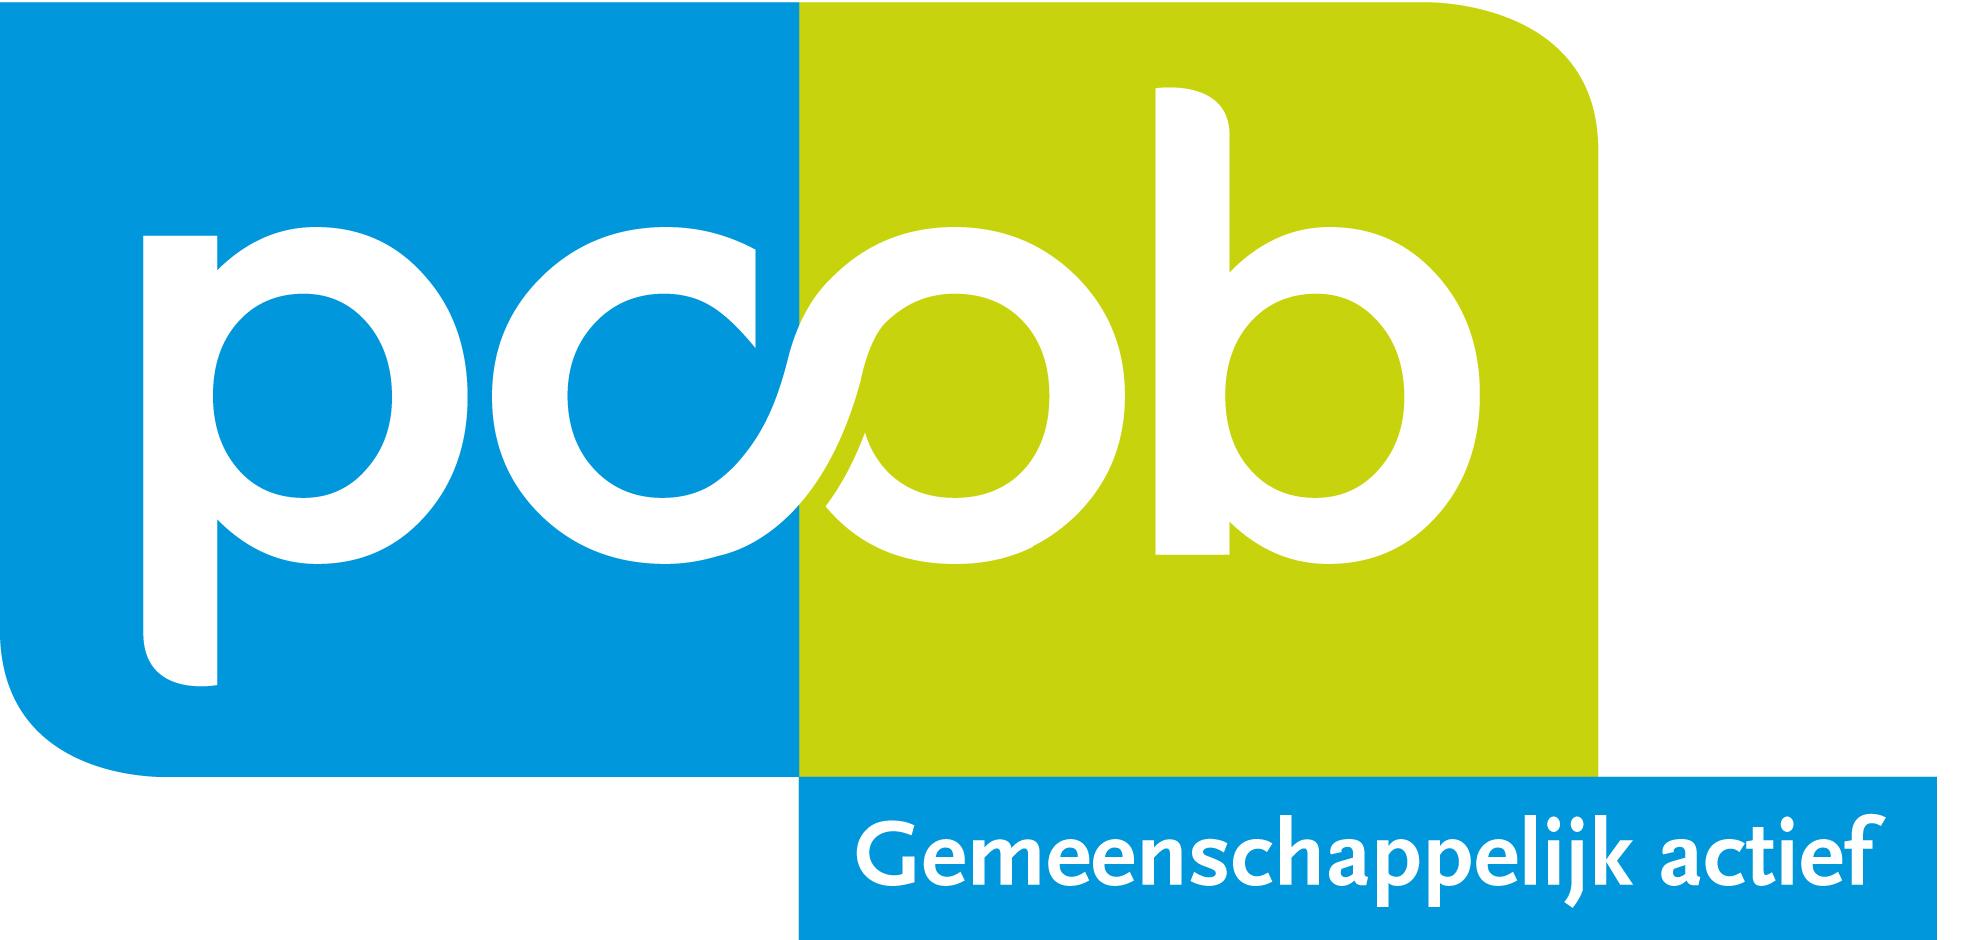 PCOB_logo_GemActief_CMYK